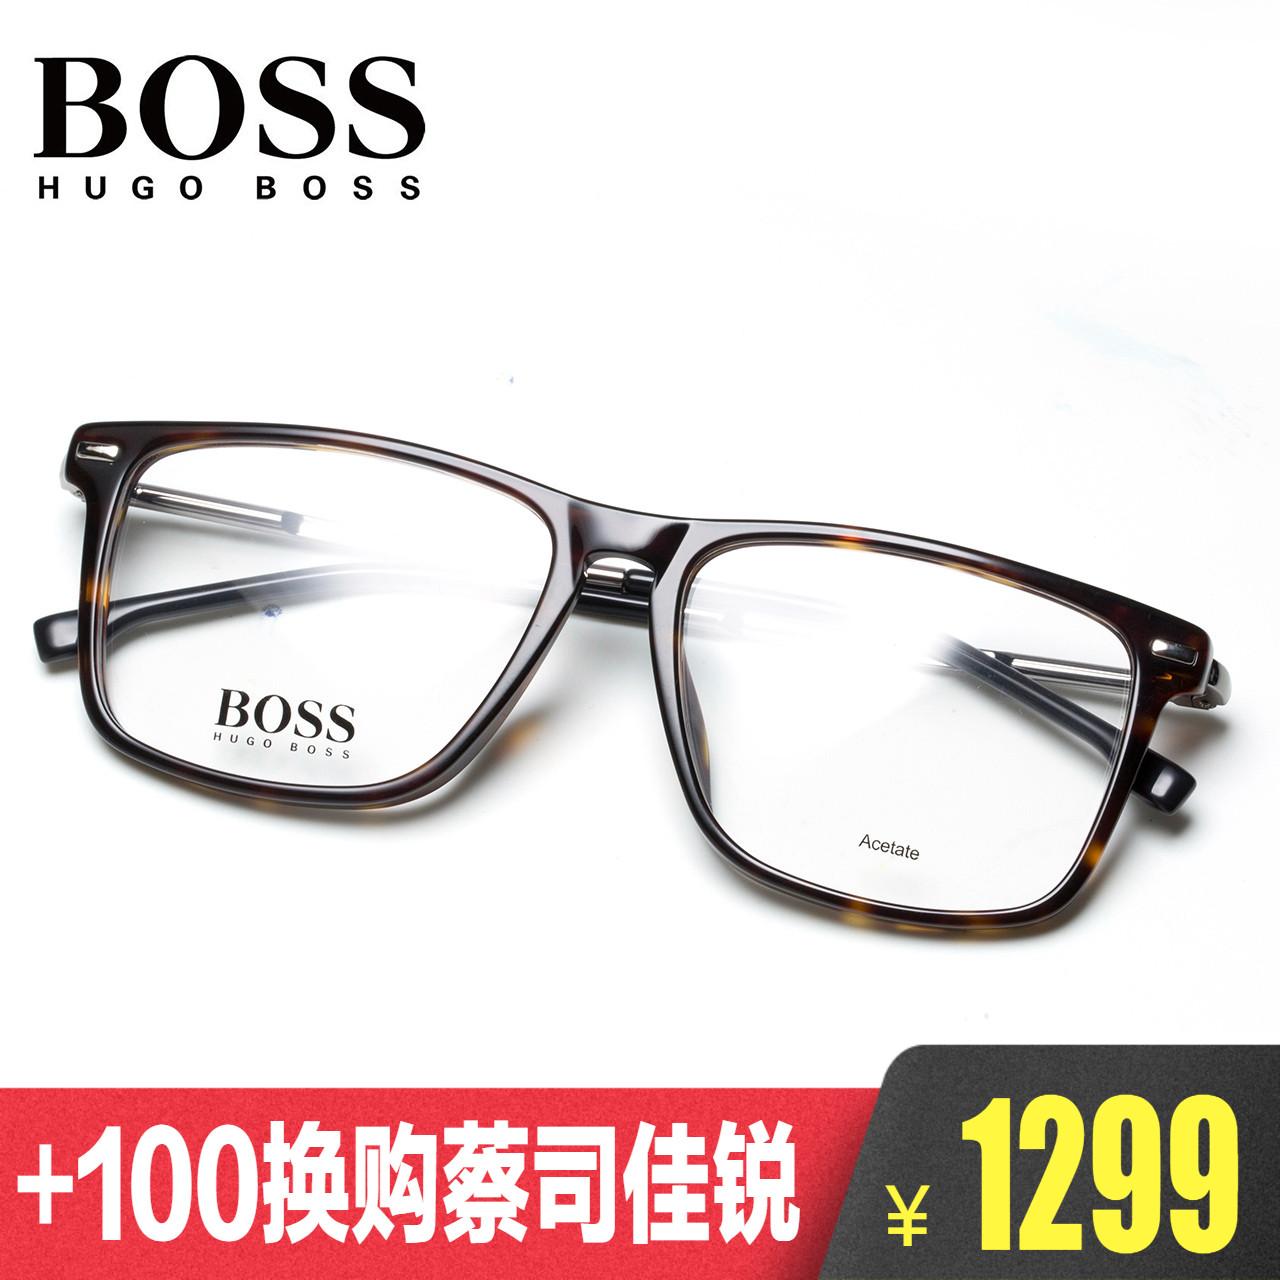 HUGO BOSS眼镜架男士圆脸方框板材时尚潮眼睛可配近视眼镜框 0931